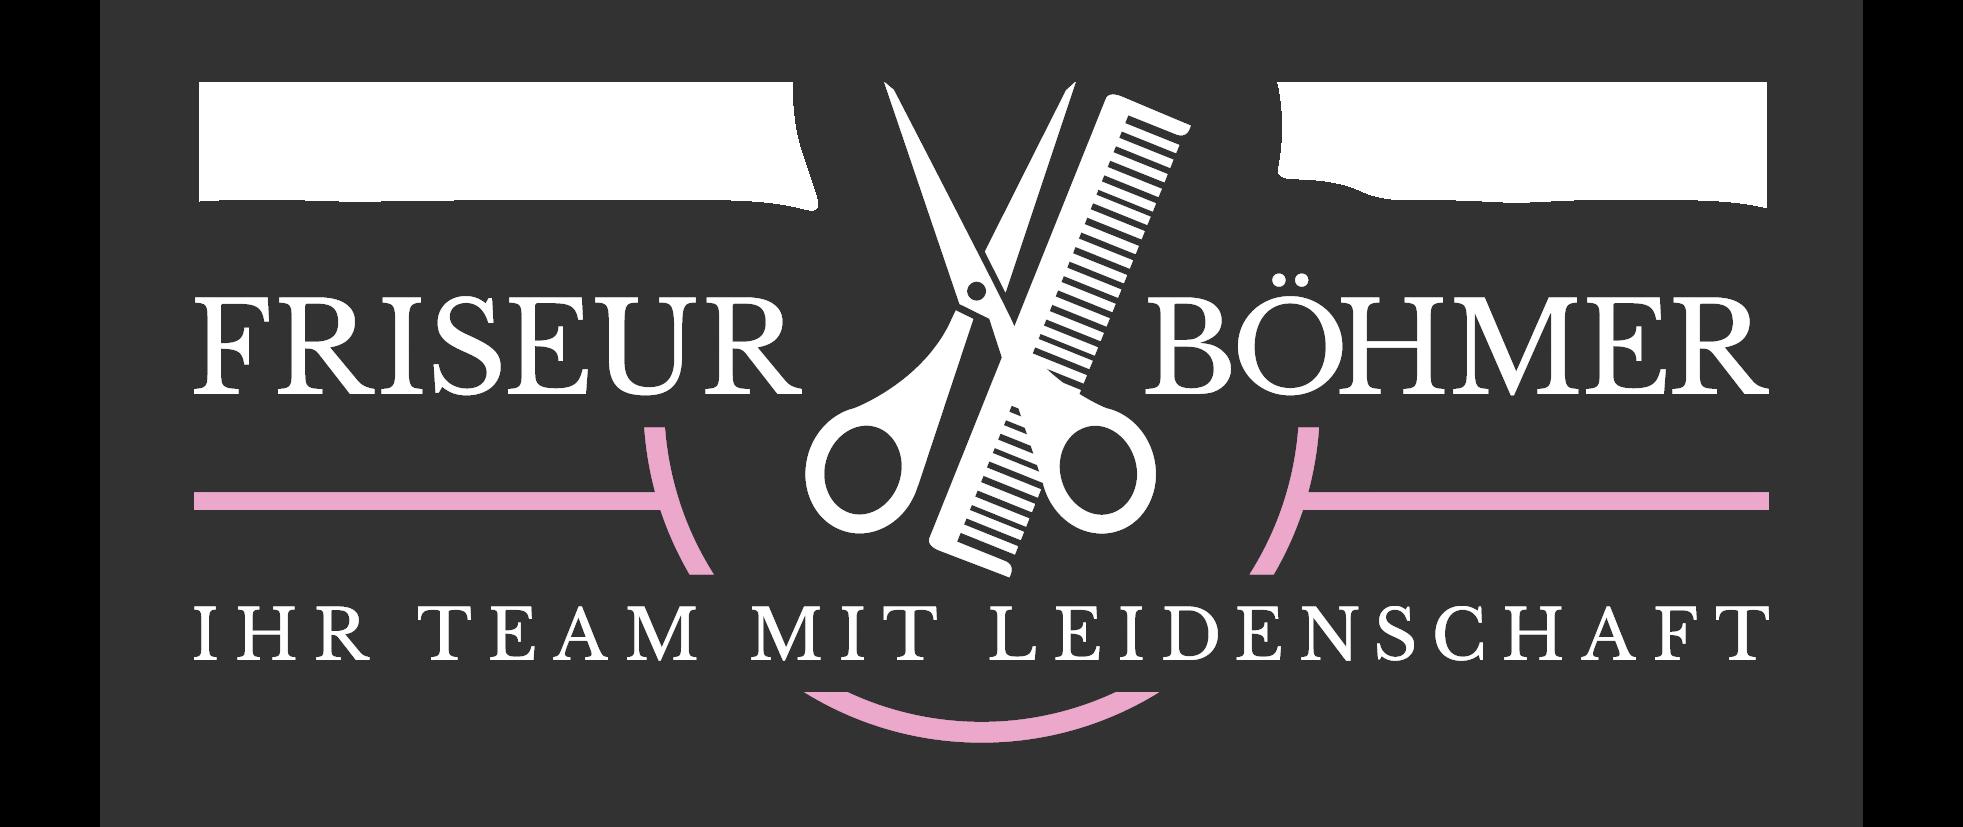 Friseur Böhmer Logo